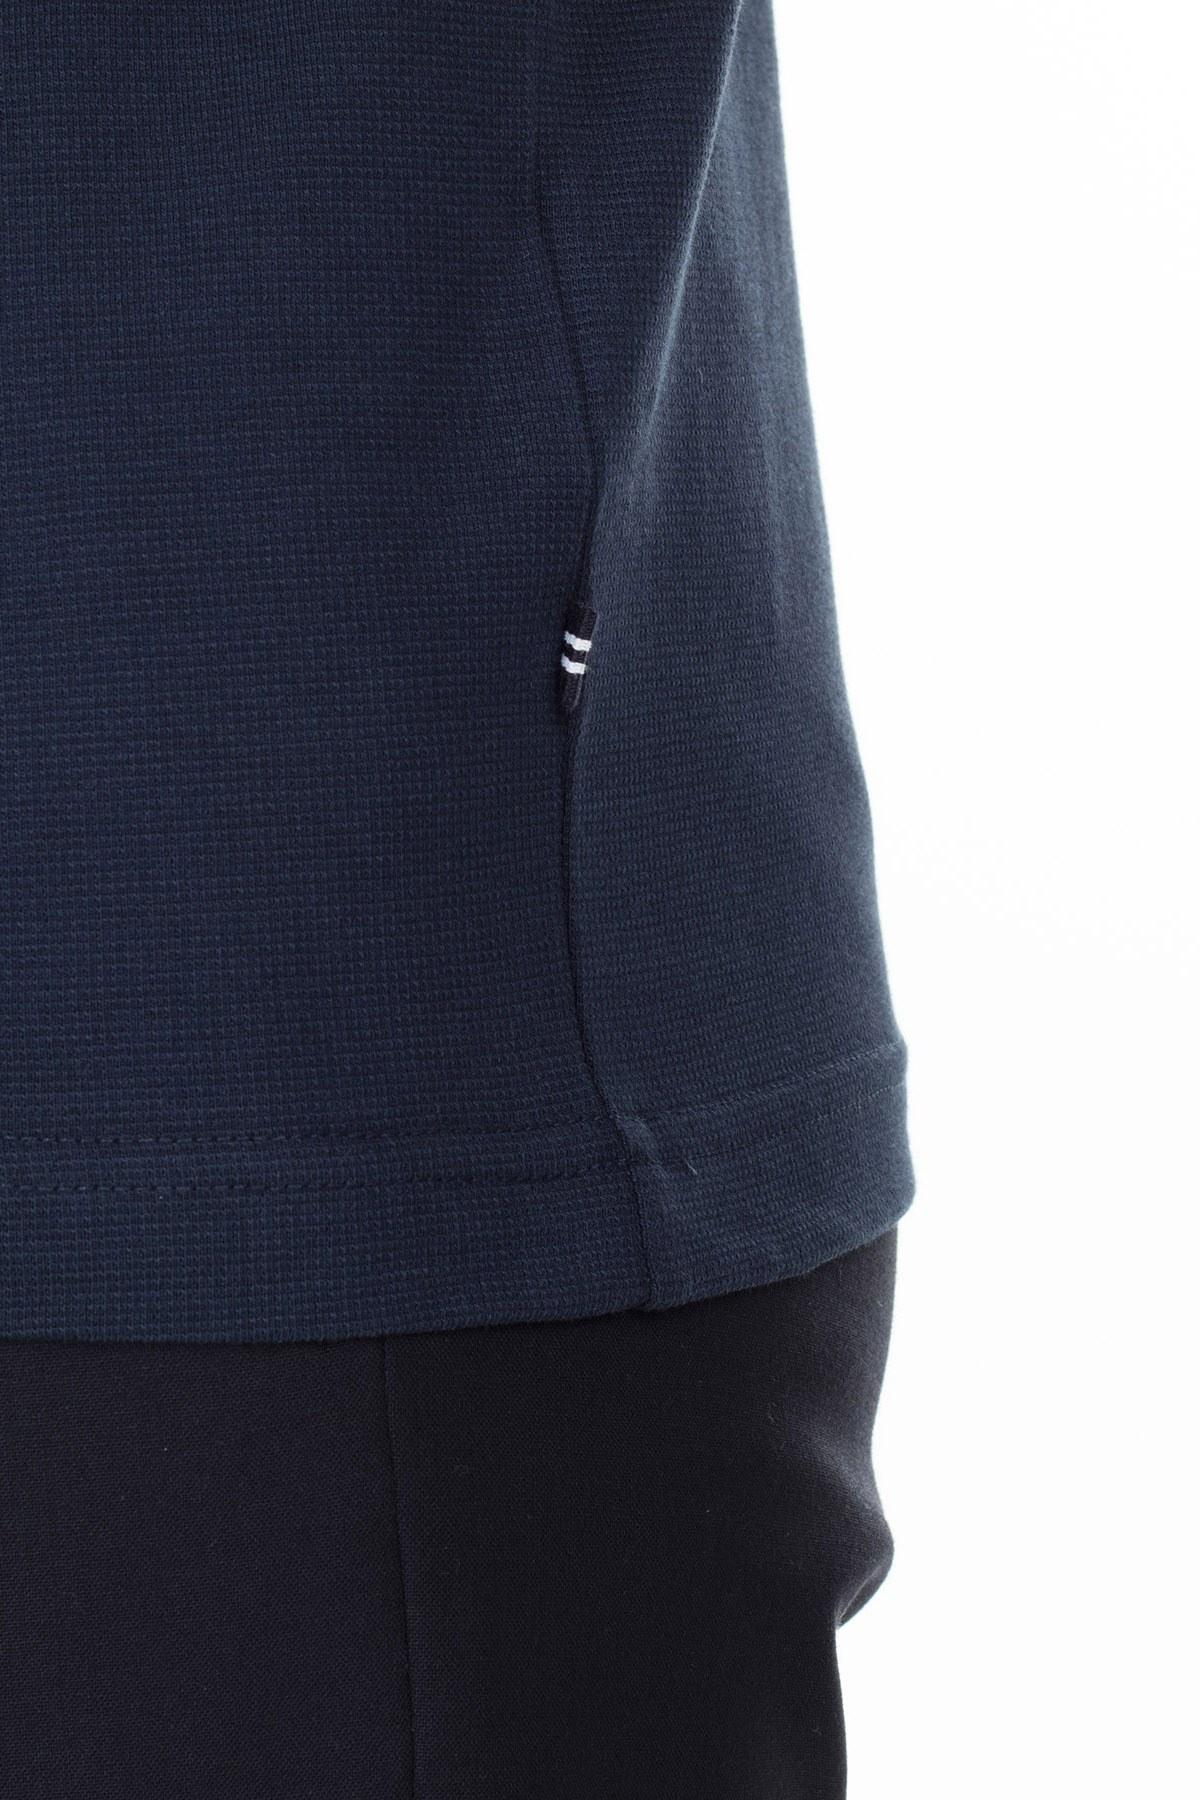 Nautica Slim Fit T Shirt Erkek Polo K01036T 4NV LACİVERT